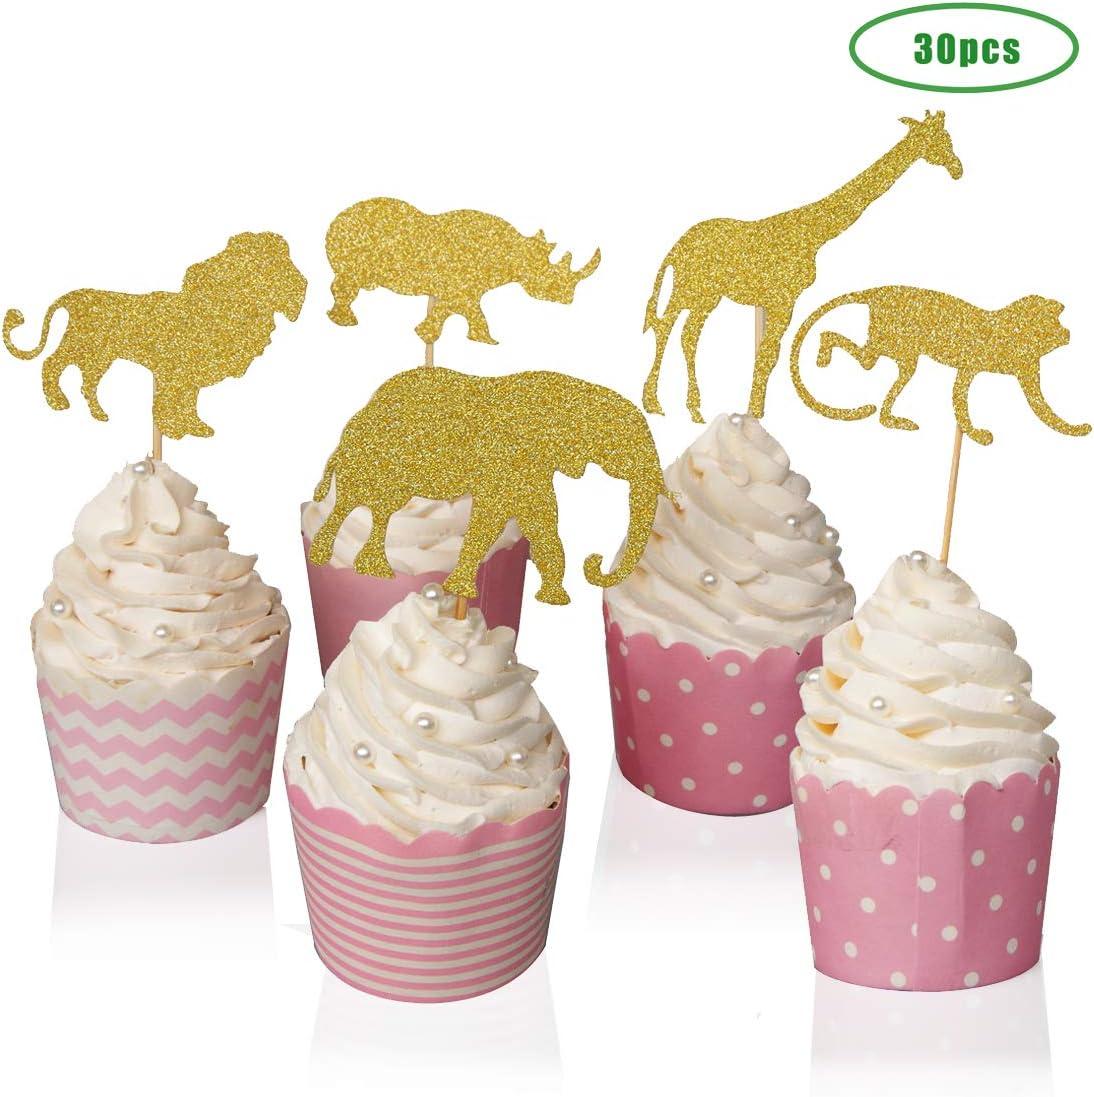 Elephant Giraffe Rhino Lion And Monkey 5 Styles Gold Glitter Jungle Safari Animal Cupcake Toppers Cake Picks Holders Set Of 30 For Baby Showers Birthday Party Cupcake Cake Decorations